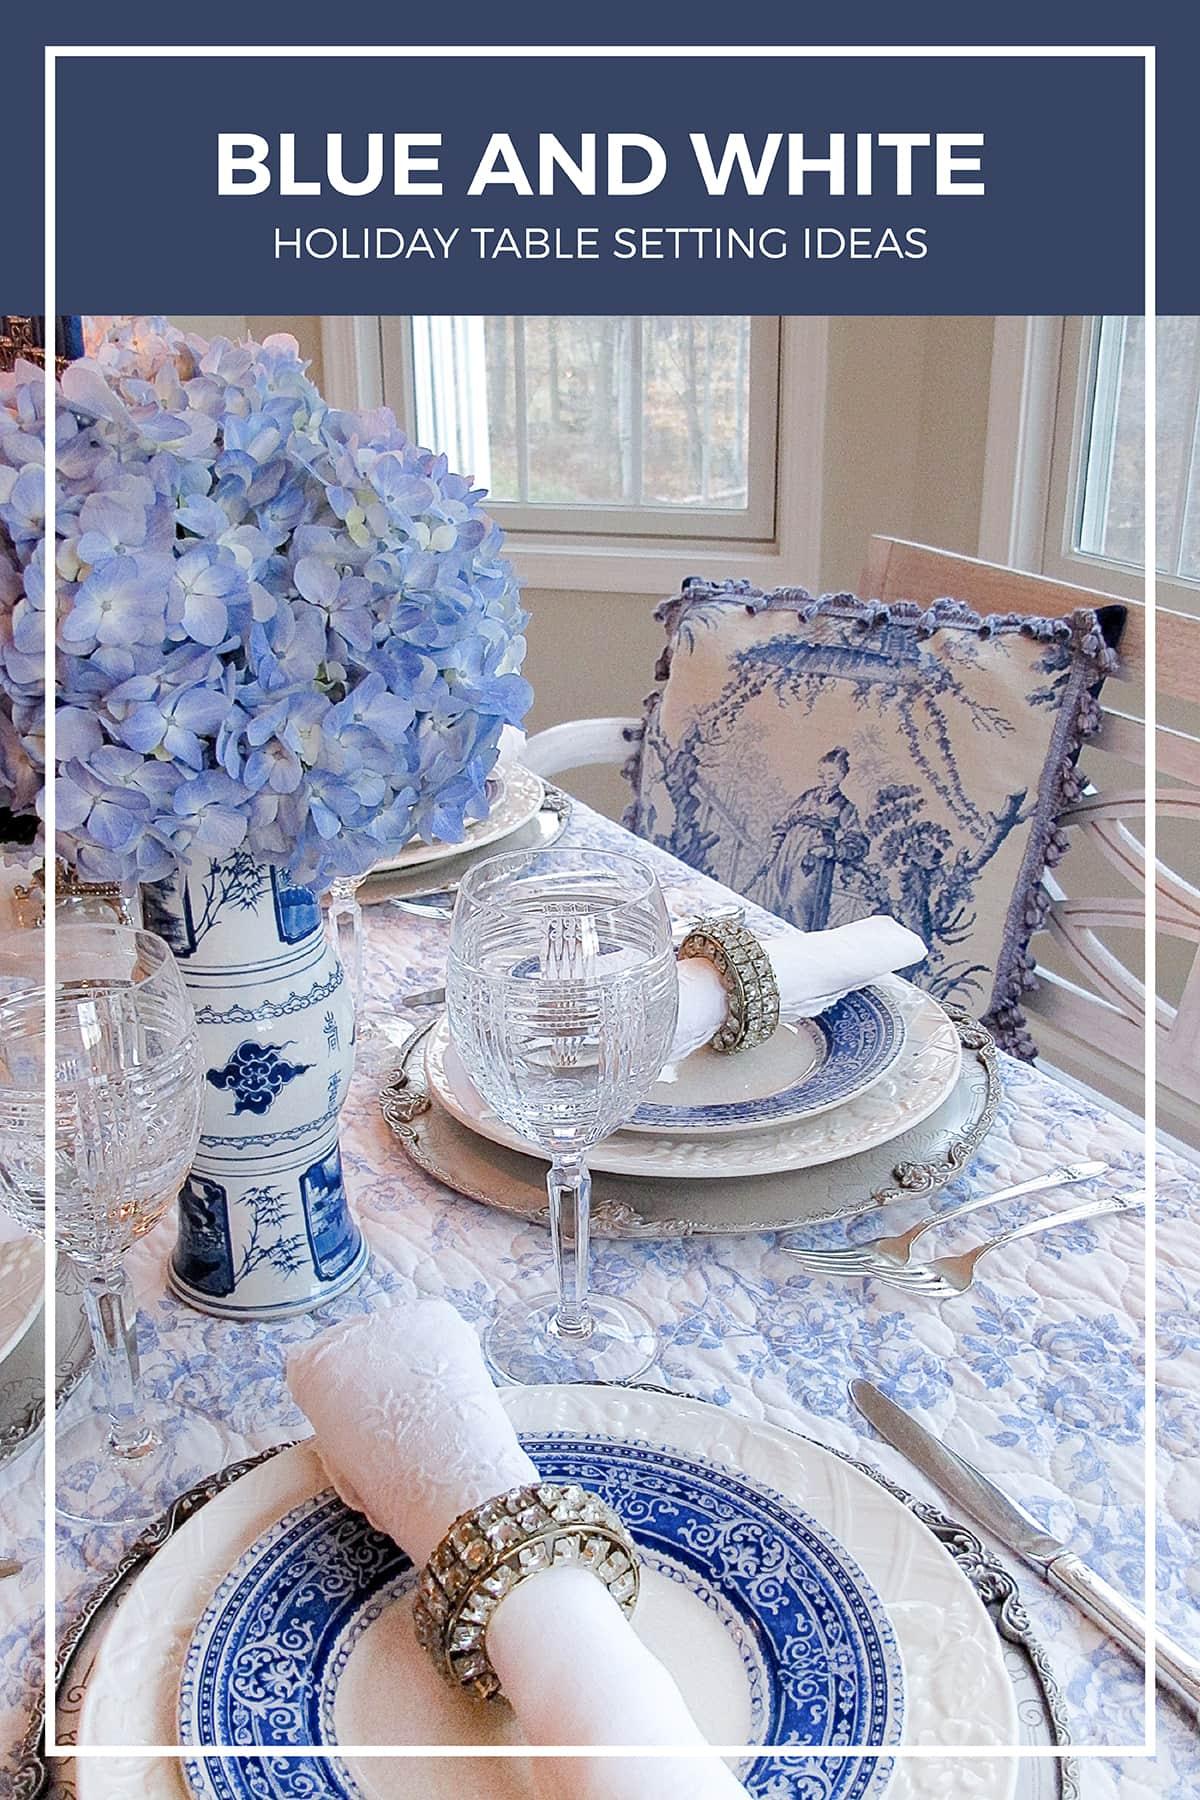 Blue and White Holiday Table Setting Ideas | Designthusiasm.com